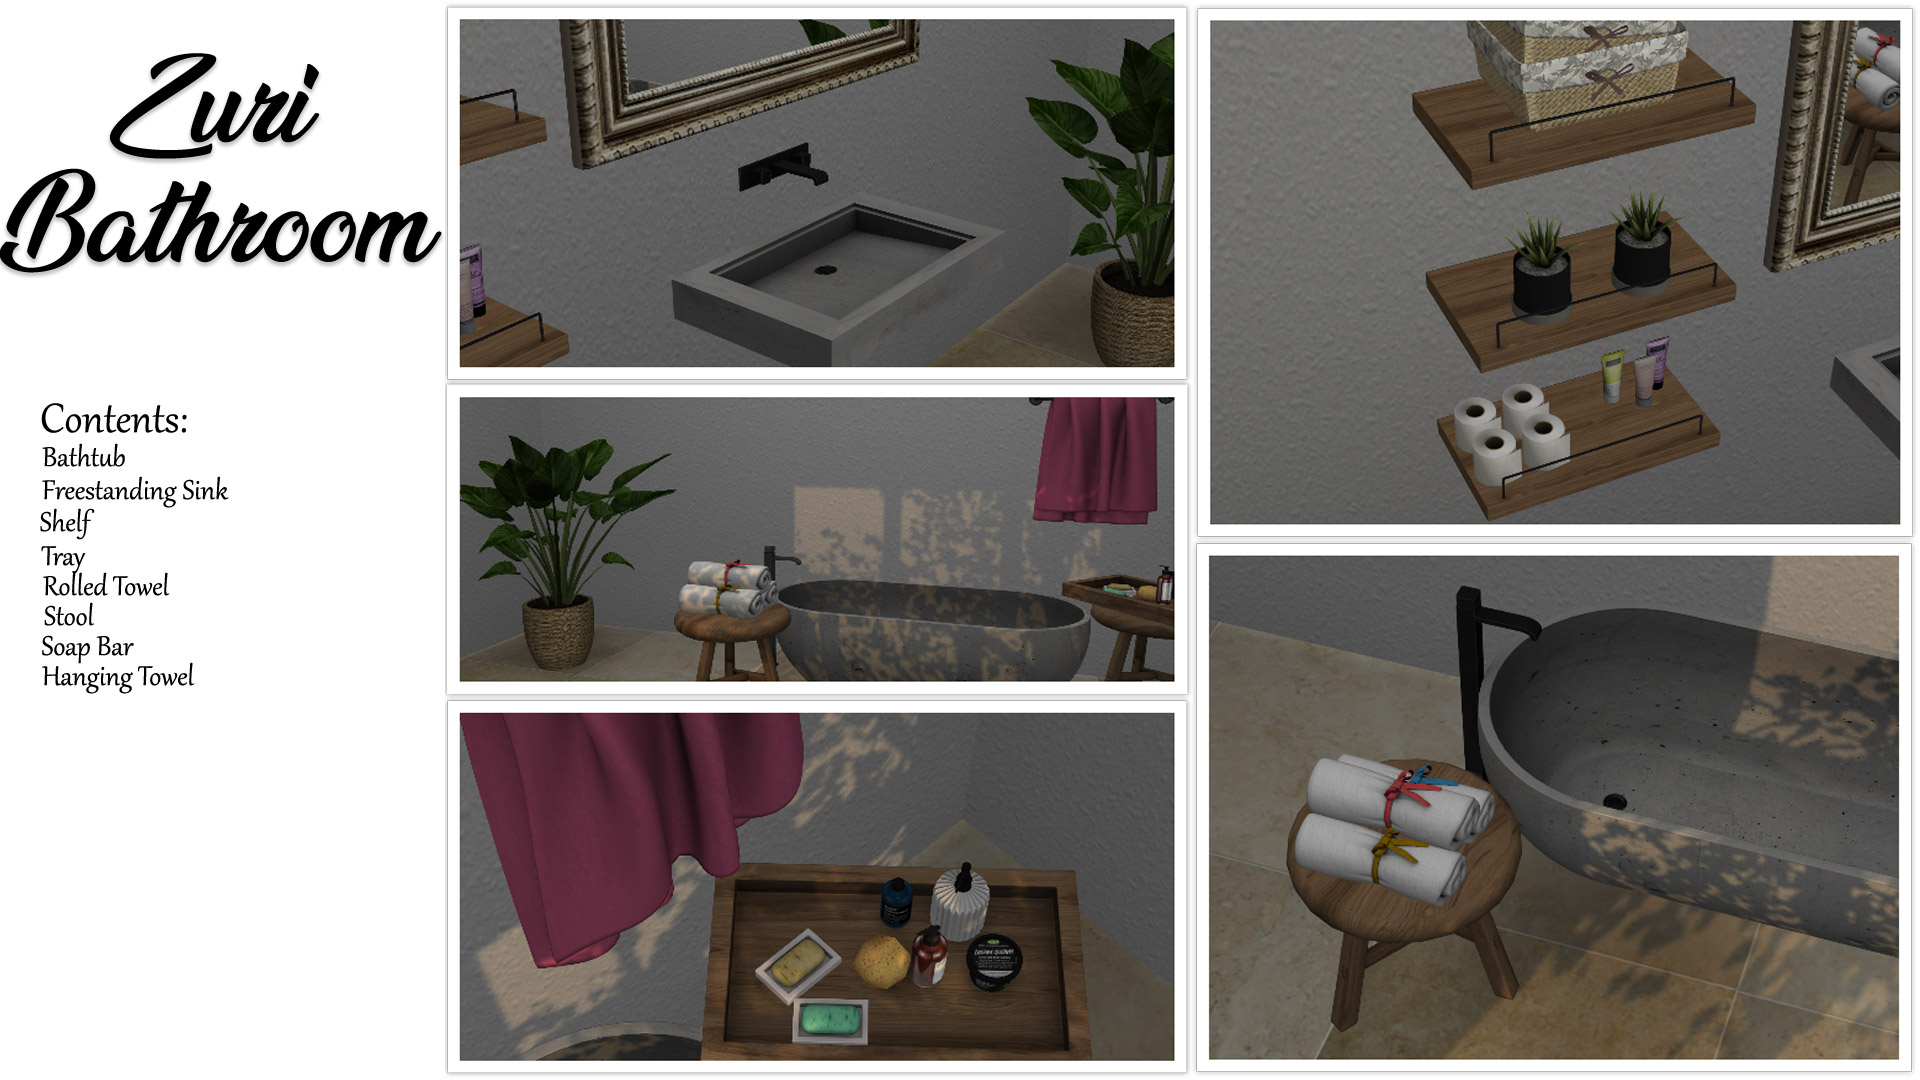 Zuri Bathroom, high quality sims 4 cc, sunkissedlilacs, free sims 4 furniture, sims 4 custom content,